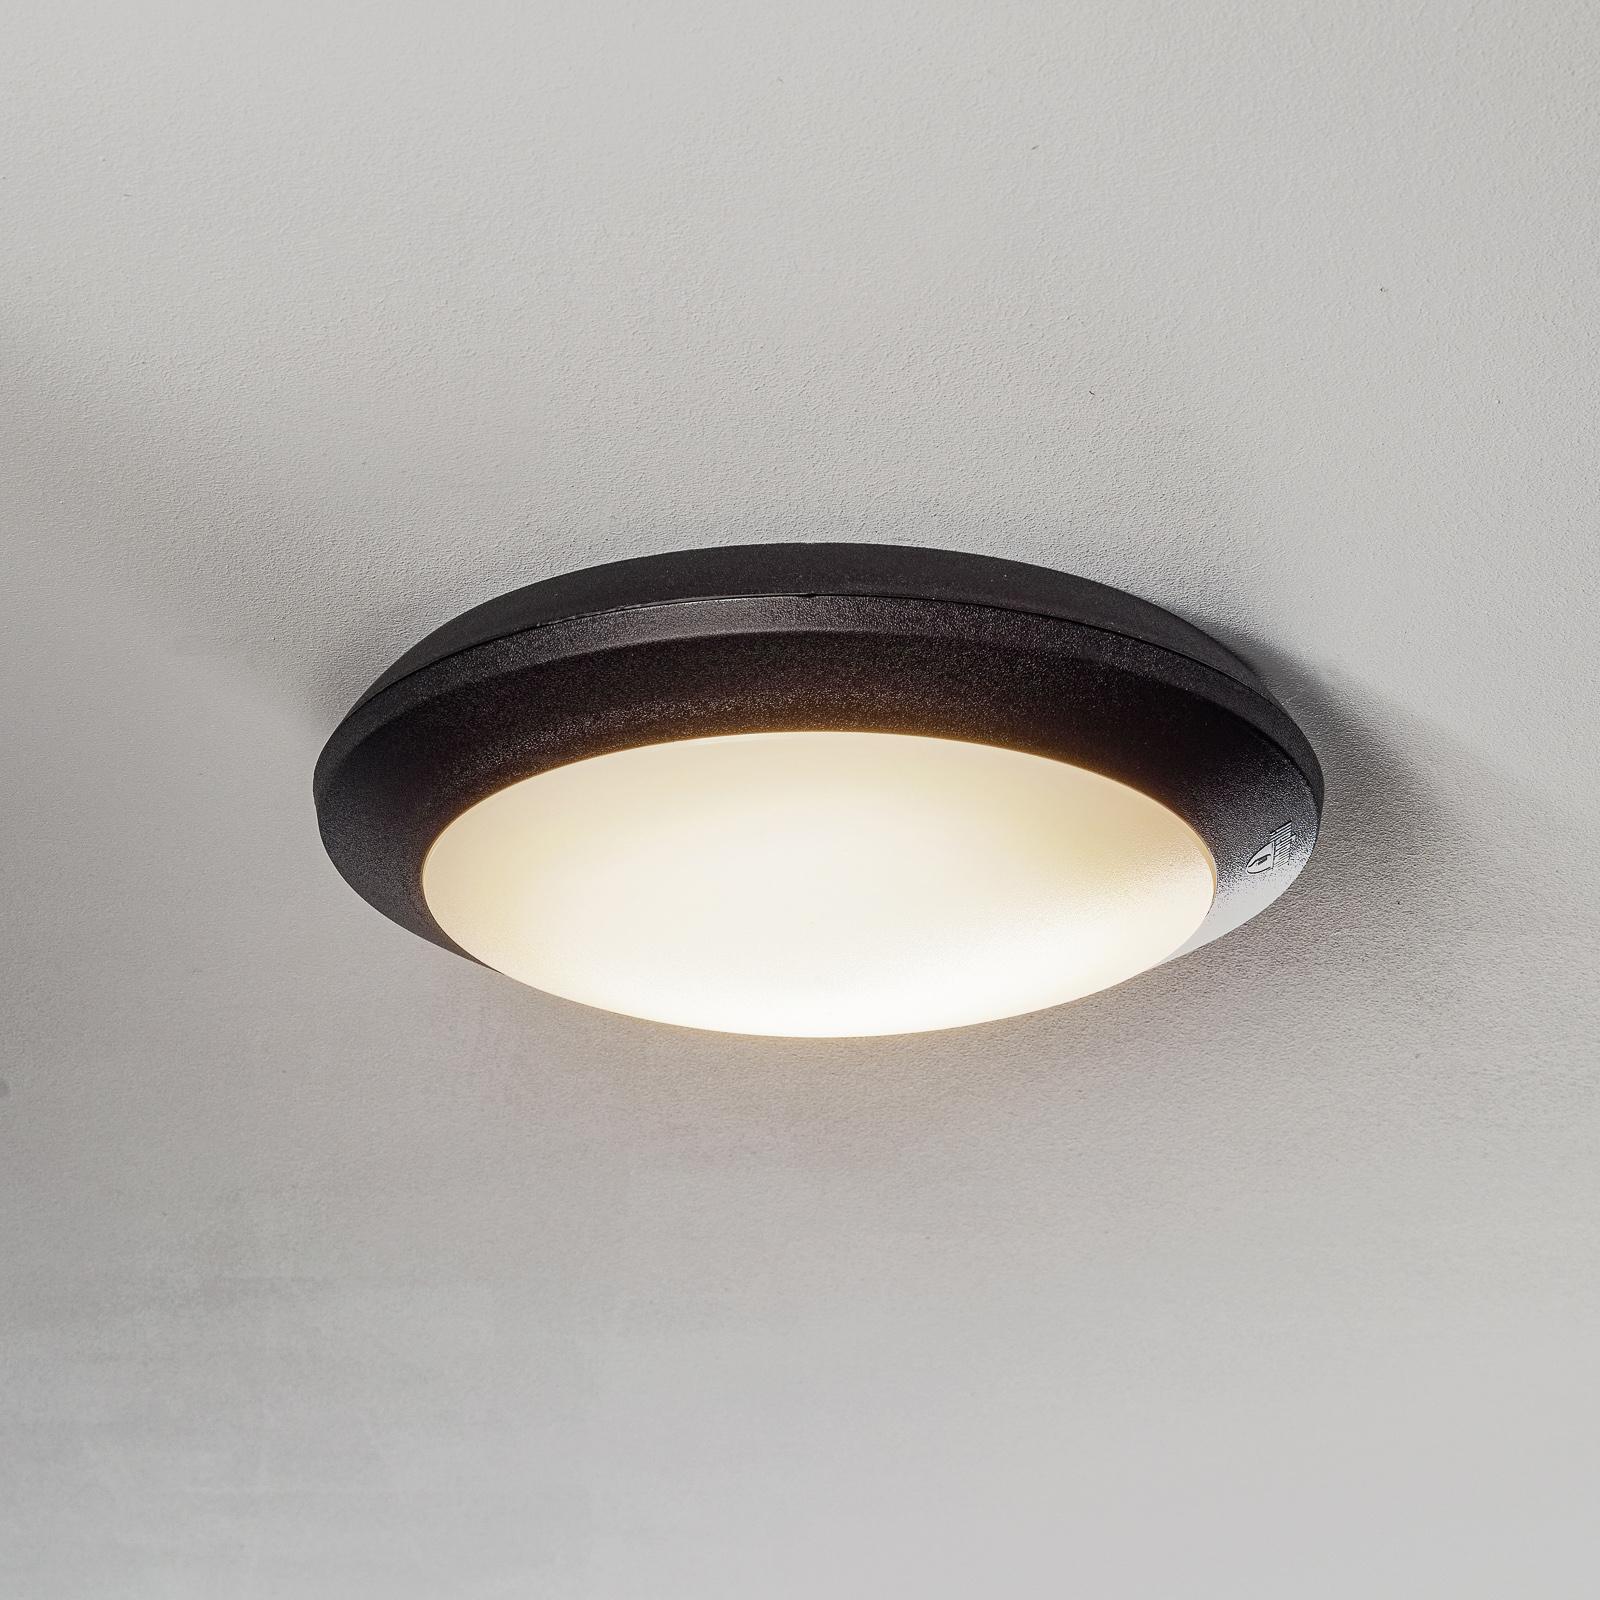 Sensor-LED-Deckenleuchte Umberta schwarz, CCT